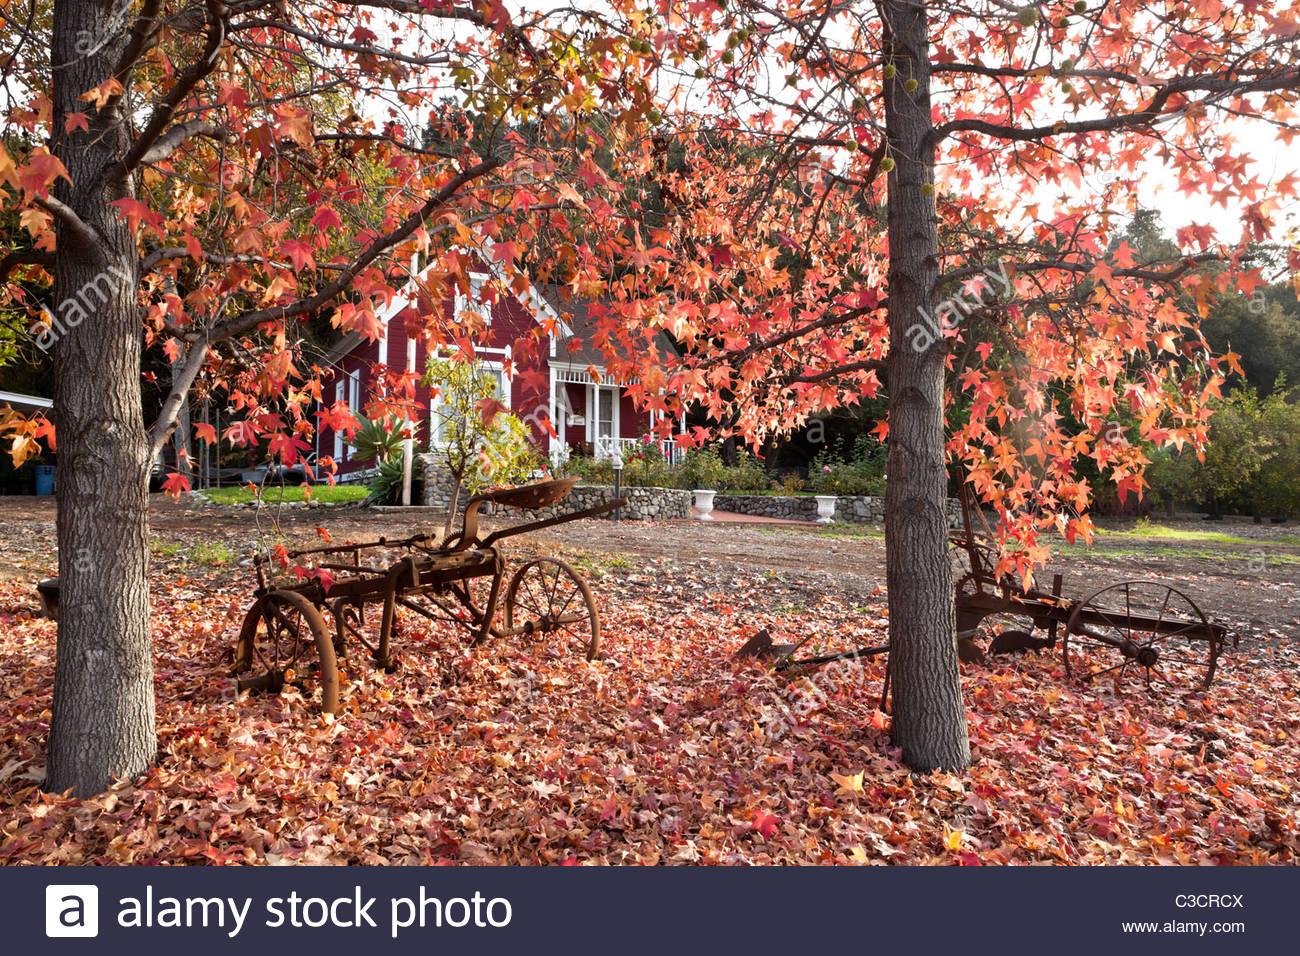 Hamilton House at Glendora Centennial Heritage Park During Peak Fall Foliage, Glendora, California Stock Photo